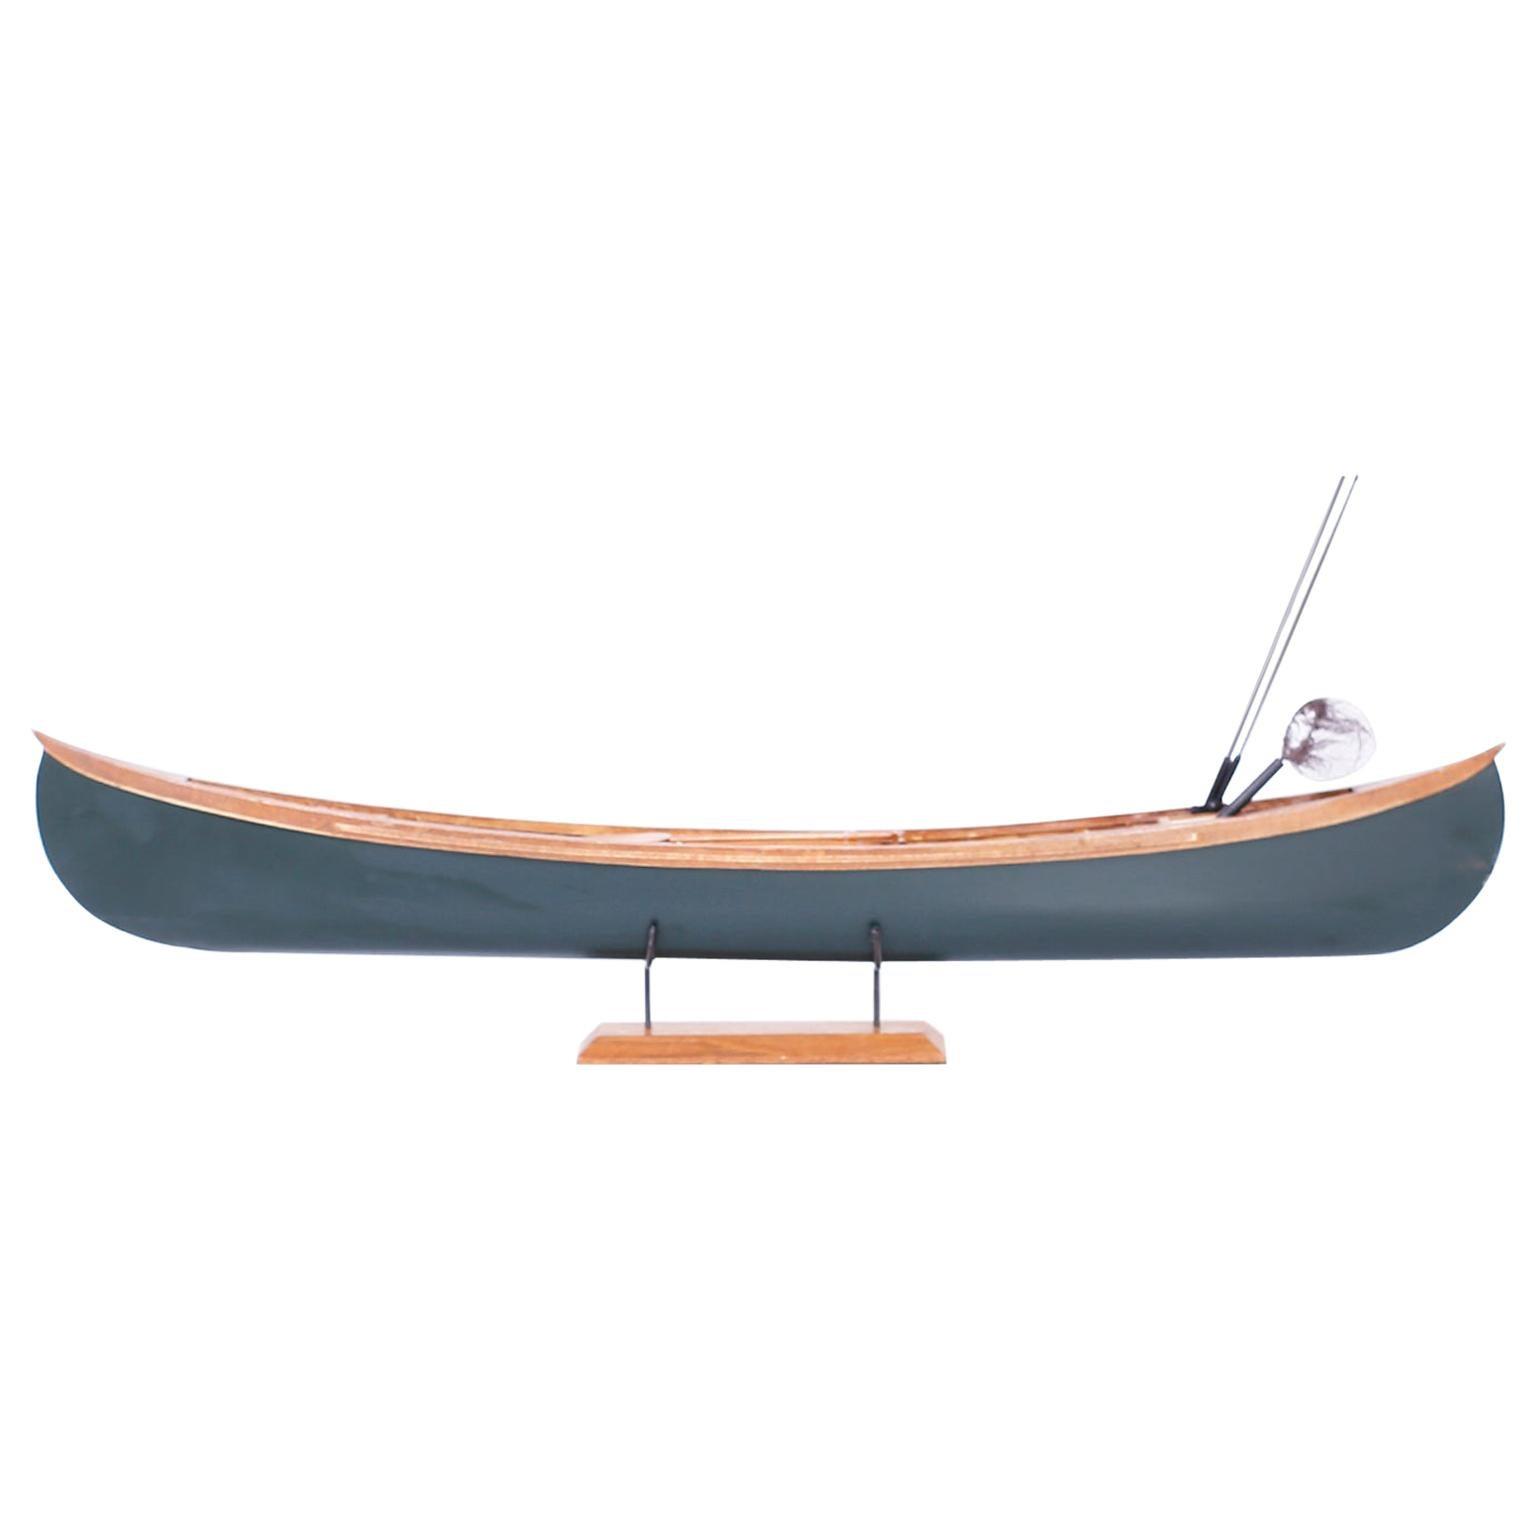 Canoe Model on Stand